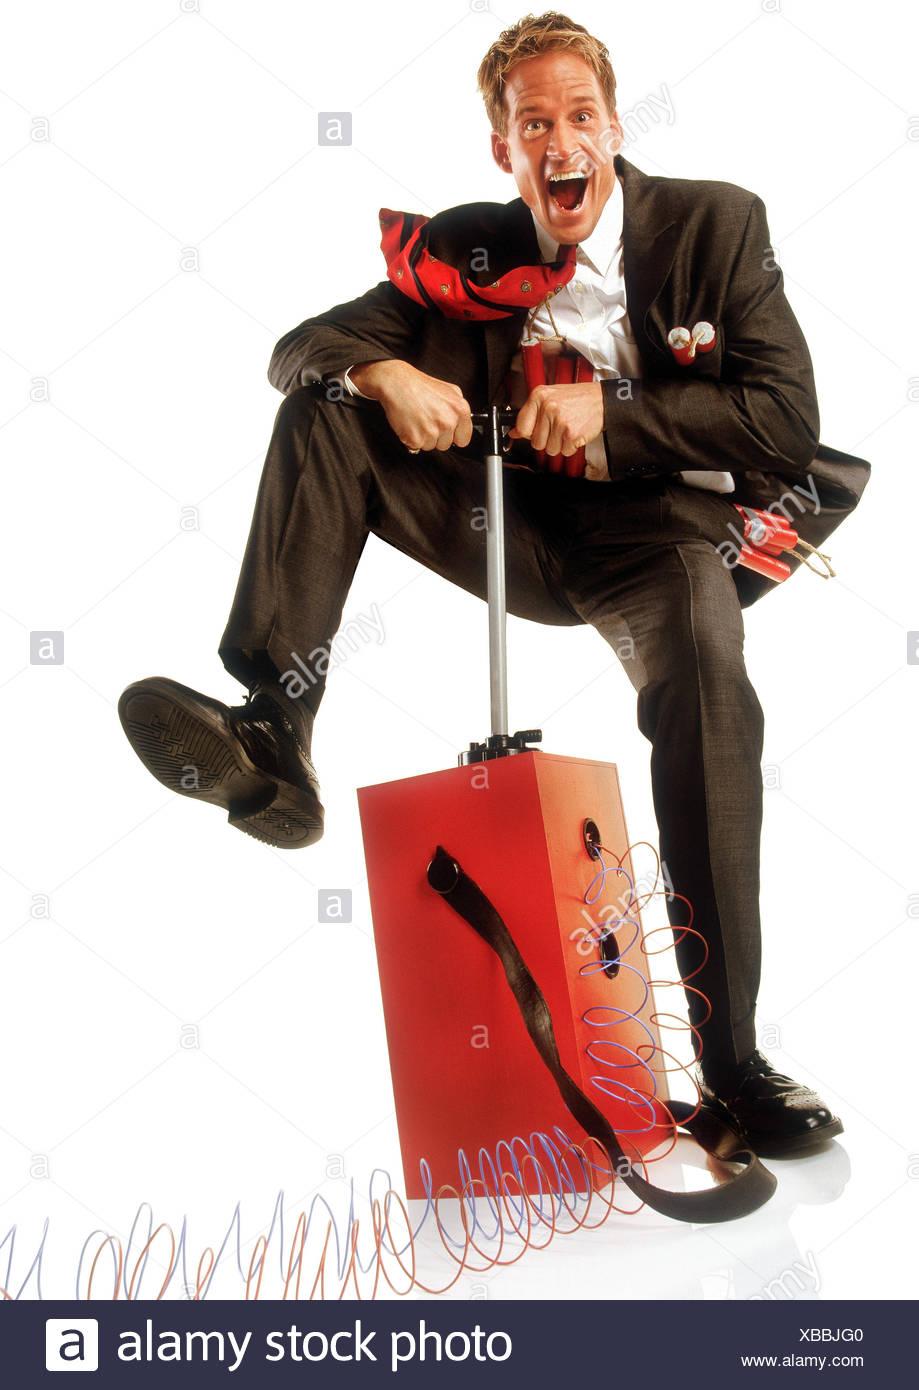 Businessman, dynamite, explosive charge, ignition mechanism, trigger, gesture concepts, businessman, spraying, sprinkle, release, ignition, breakdown, abnormal termination, release, destruction, power, lunacy, studio, copy space - Stock Image